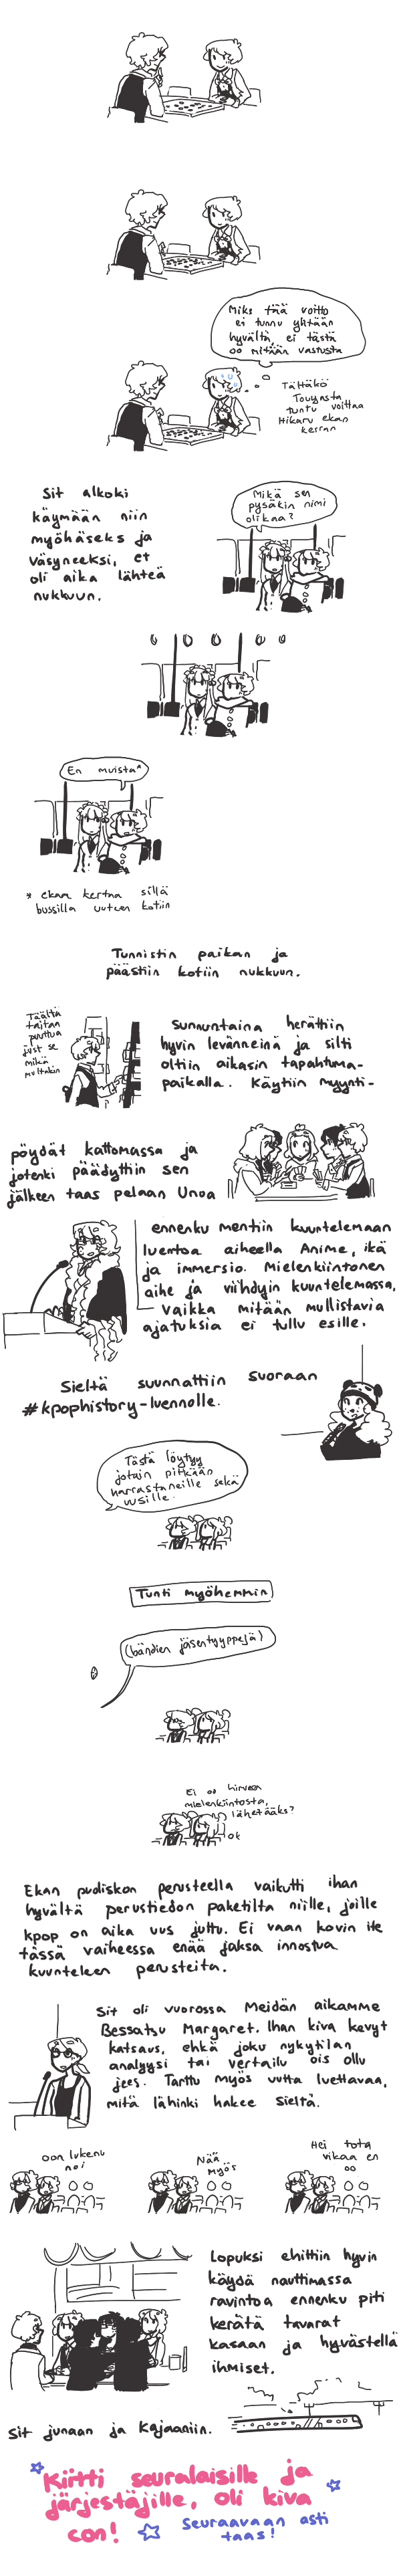 Sarjakuva416 TraconX2